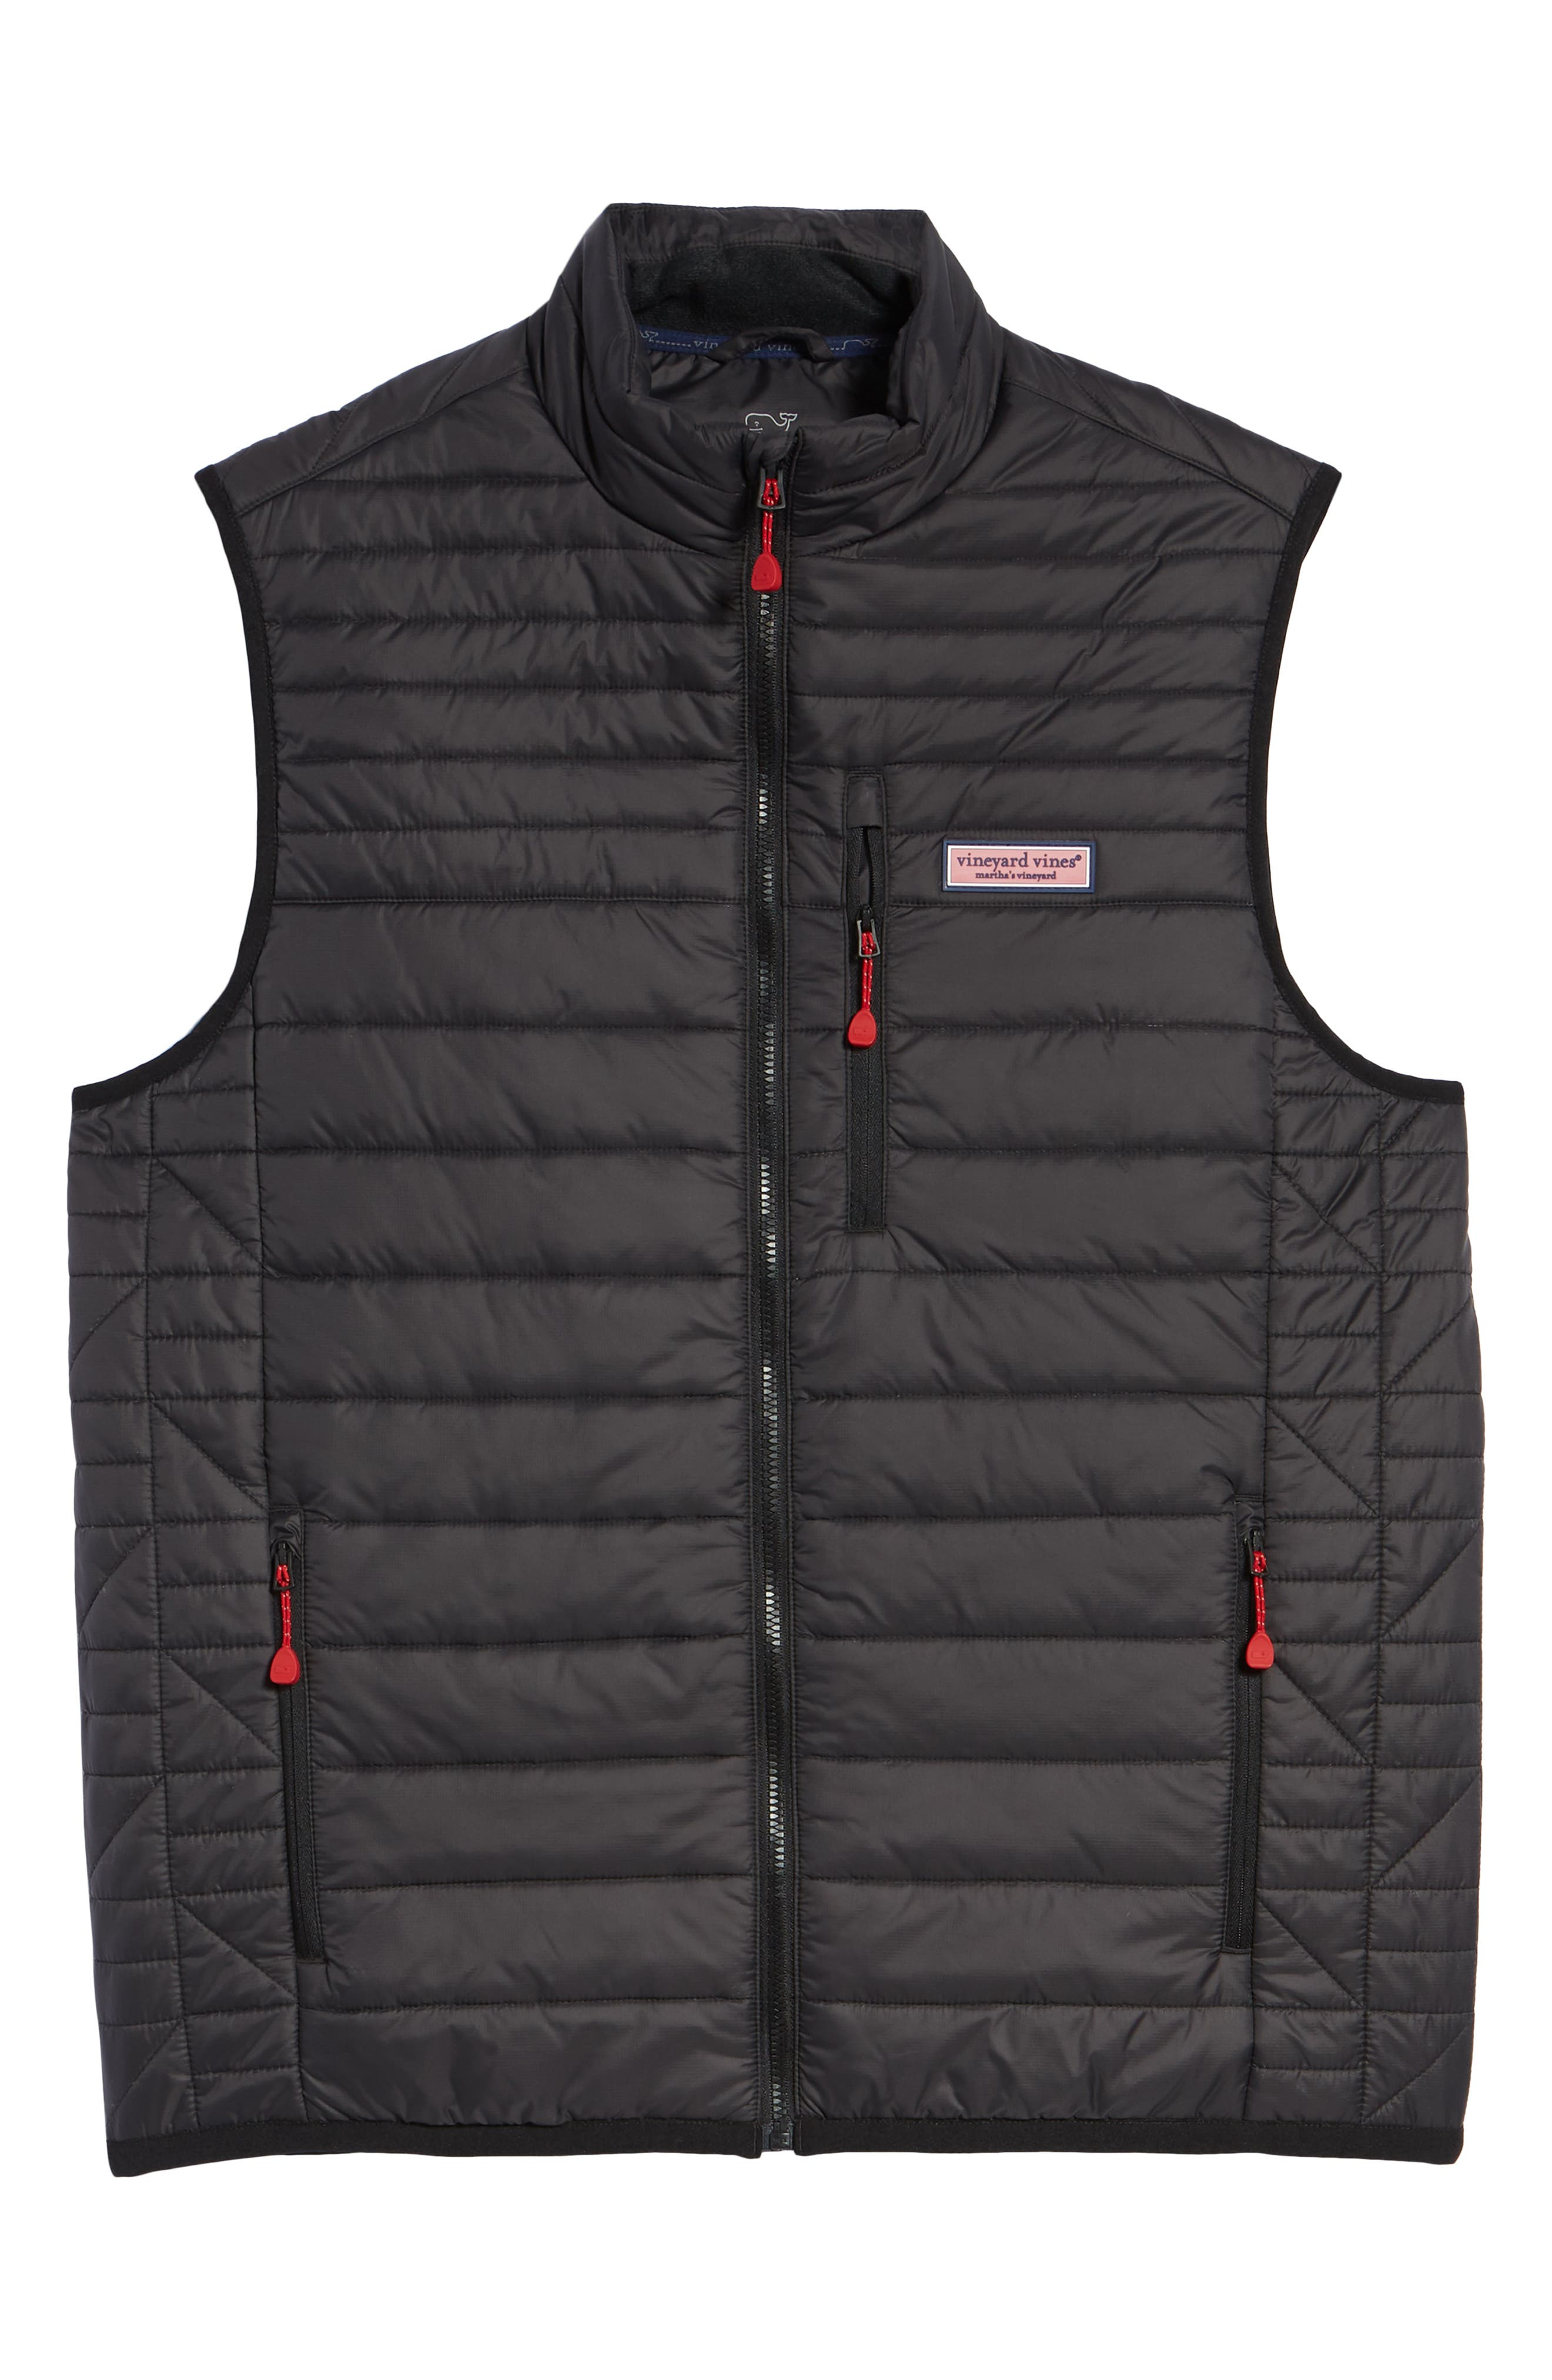 VINEYARD VINES,                             Regular Fit Down Mountain Vest,                             Alternate thumbnail 6, color,                             002